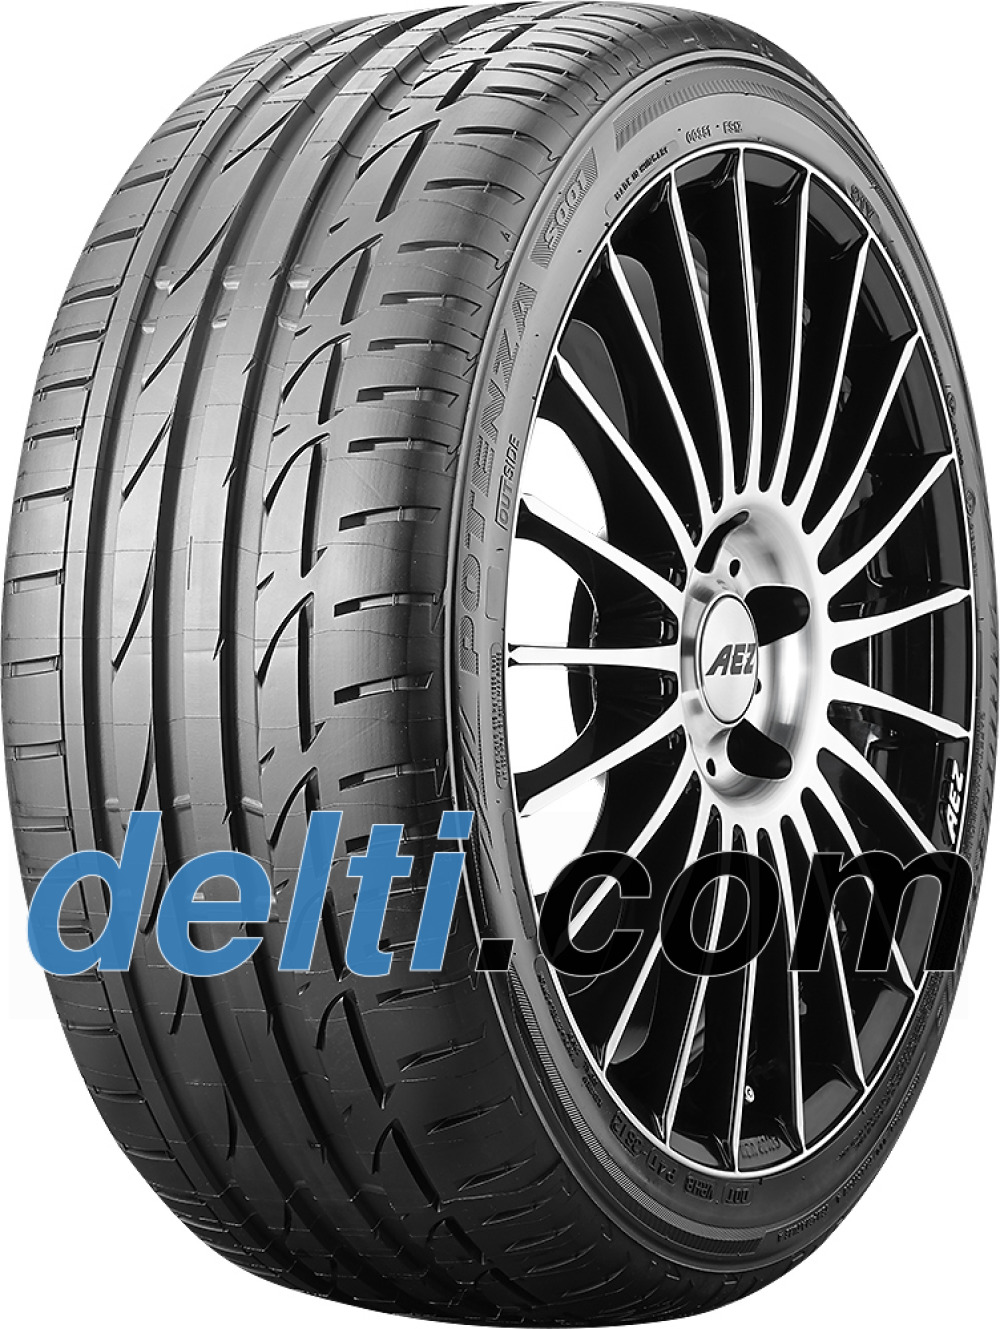 Bridgestone Potenza S001 ( 245/40 R20 99W XL *, met velgrandbescherming (MFS) )